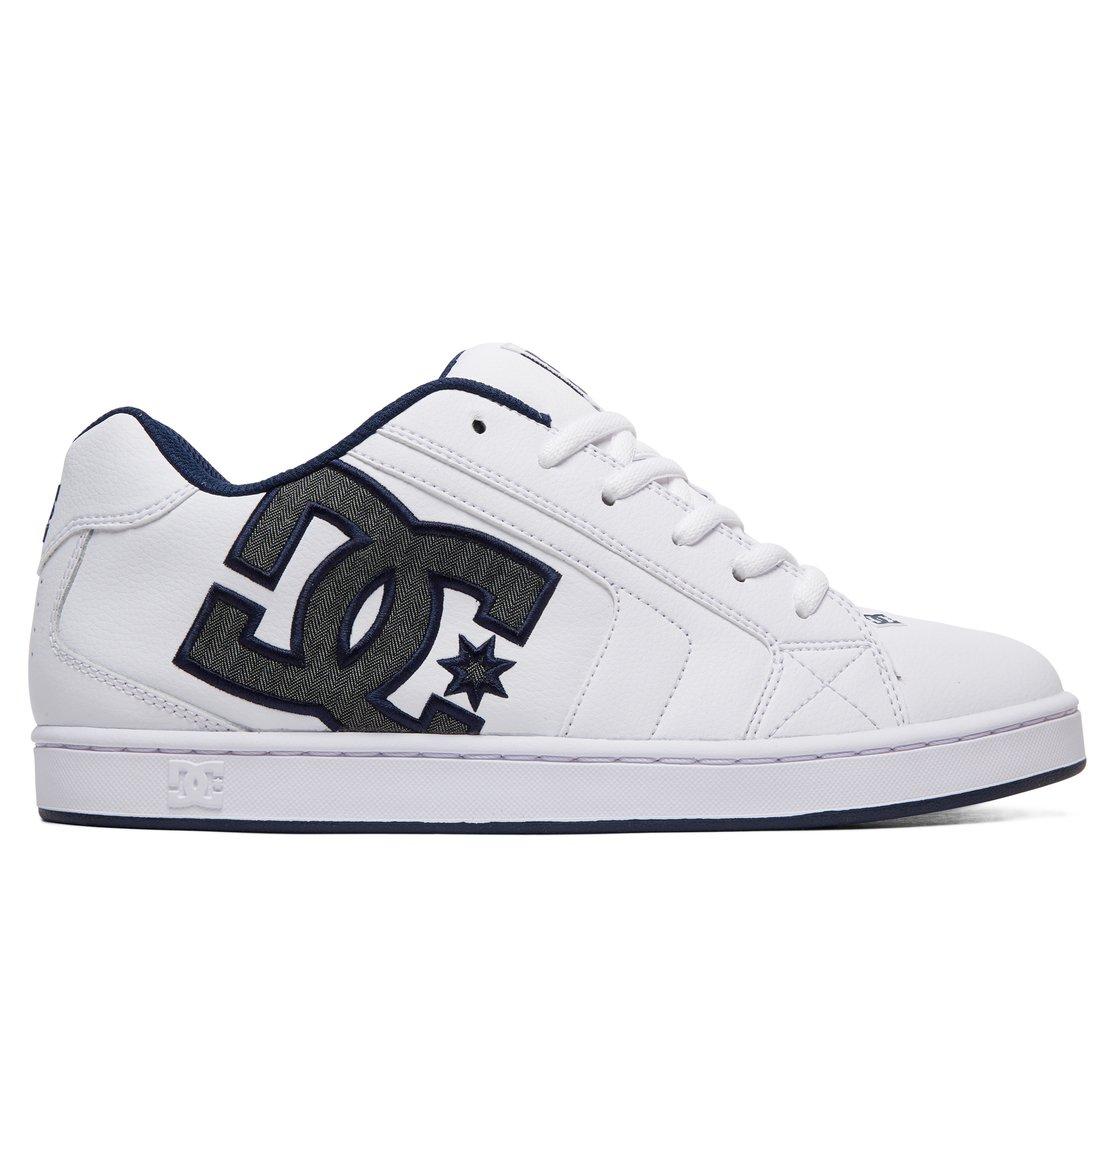 Shoes Zapatos DC Blanco 302297 Hombre para SE 0 Net Owx8qvW6